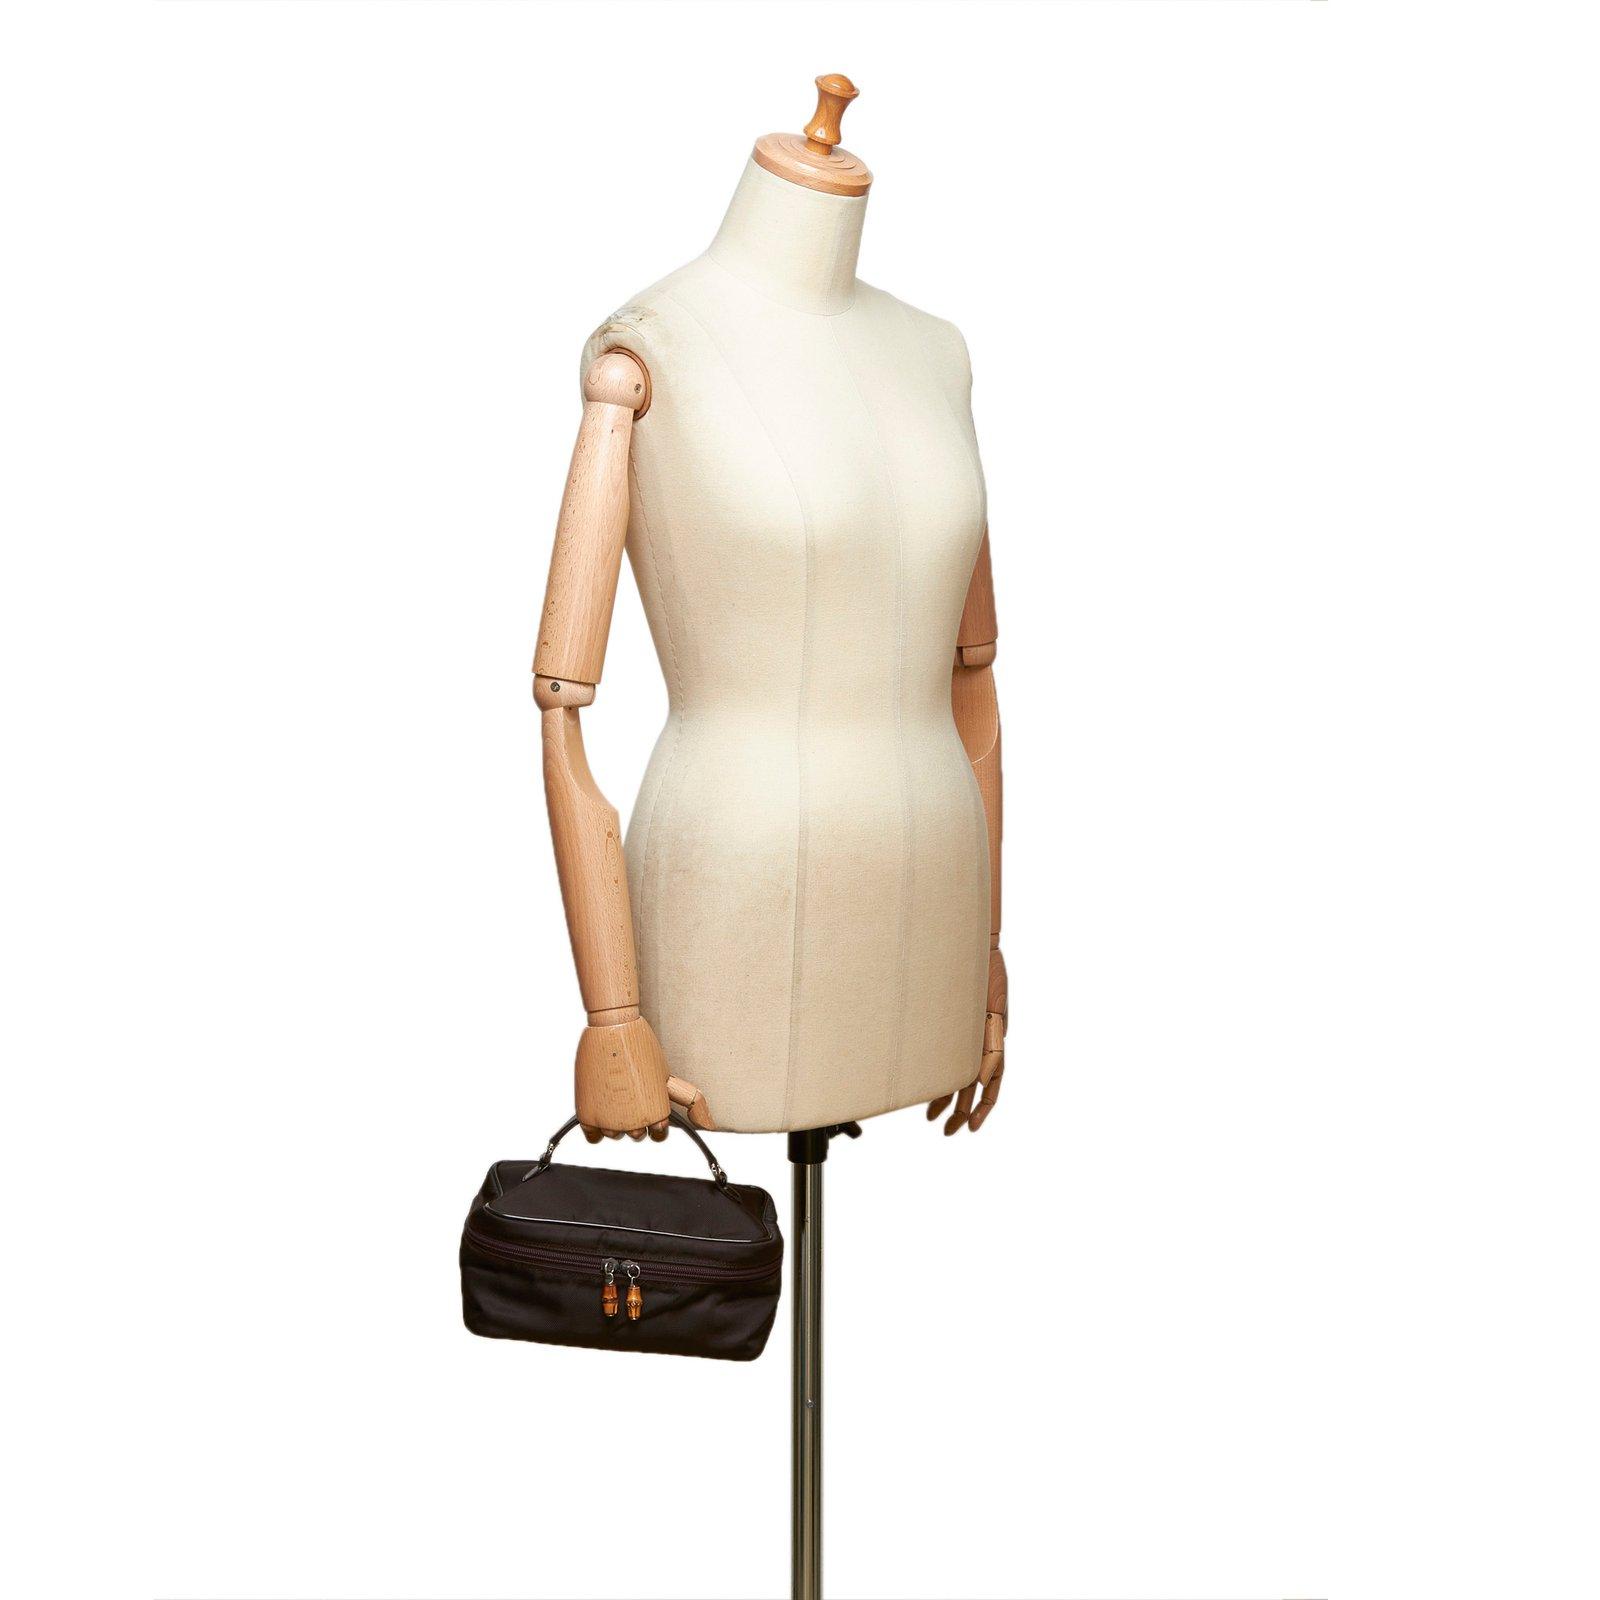 2587ca87971b12 Gucci Bamboo Nylon Vanity Bag Handbags Leather,Other,Nylon,Cloth Brown,Dark  brown ref.98265 - Joli Closet